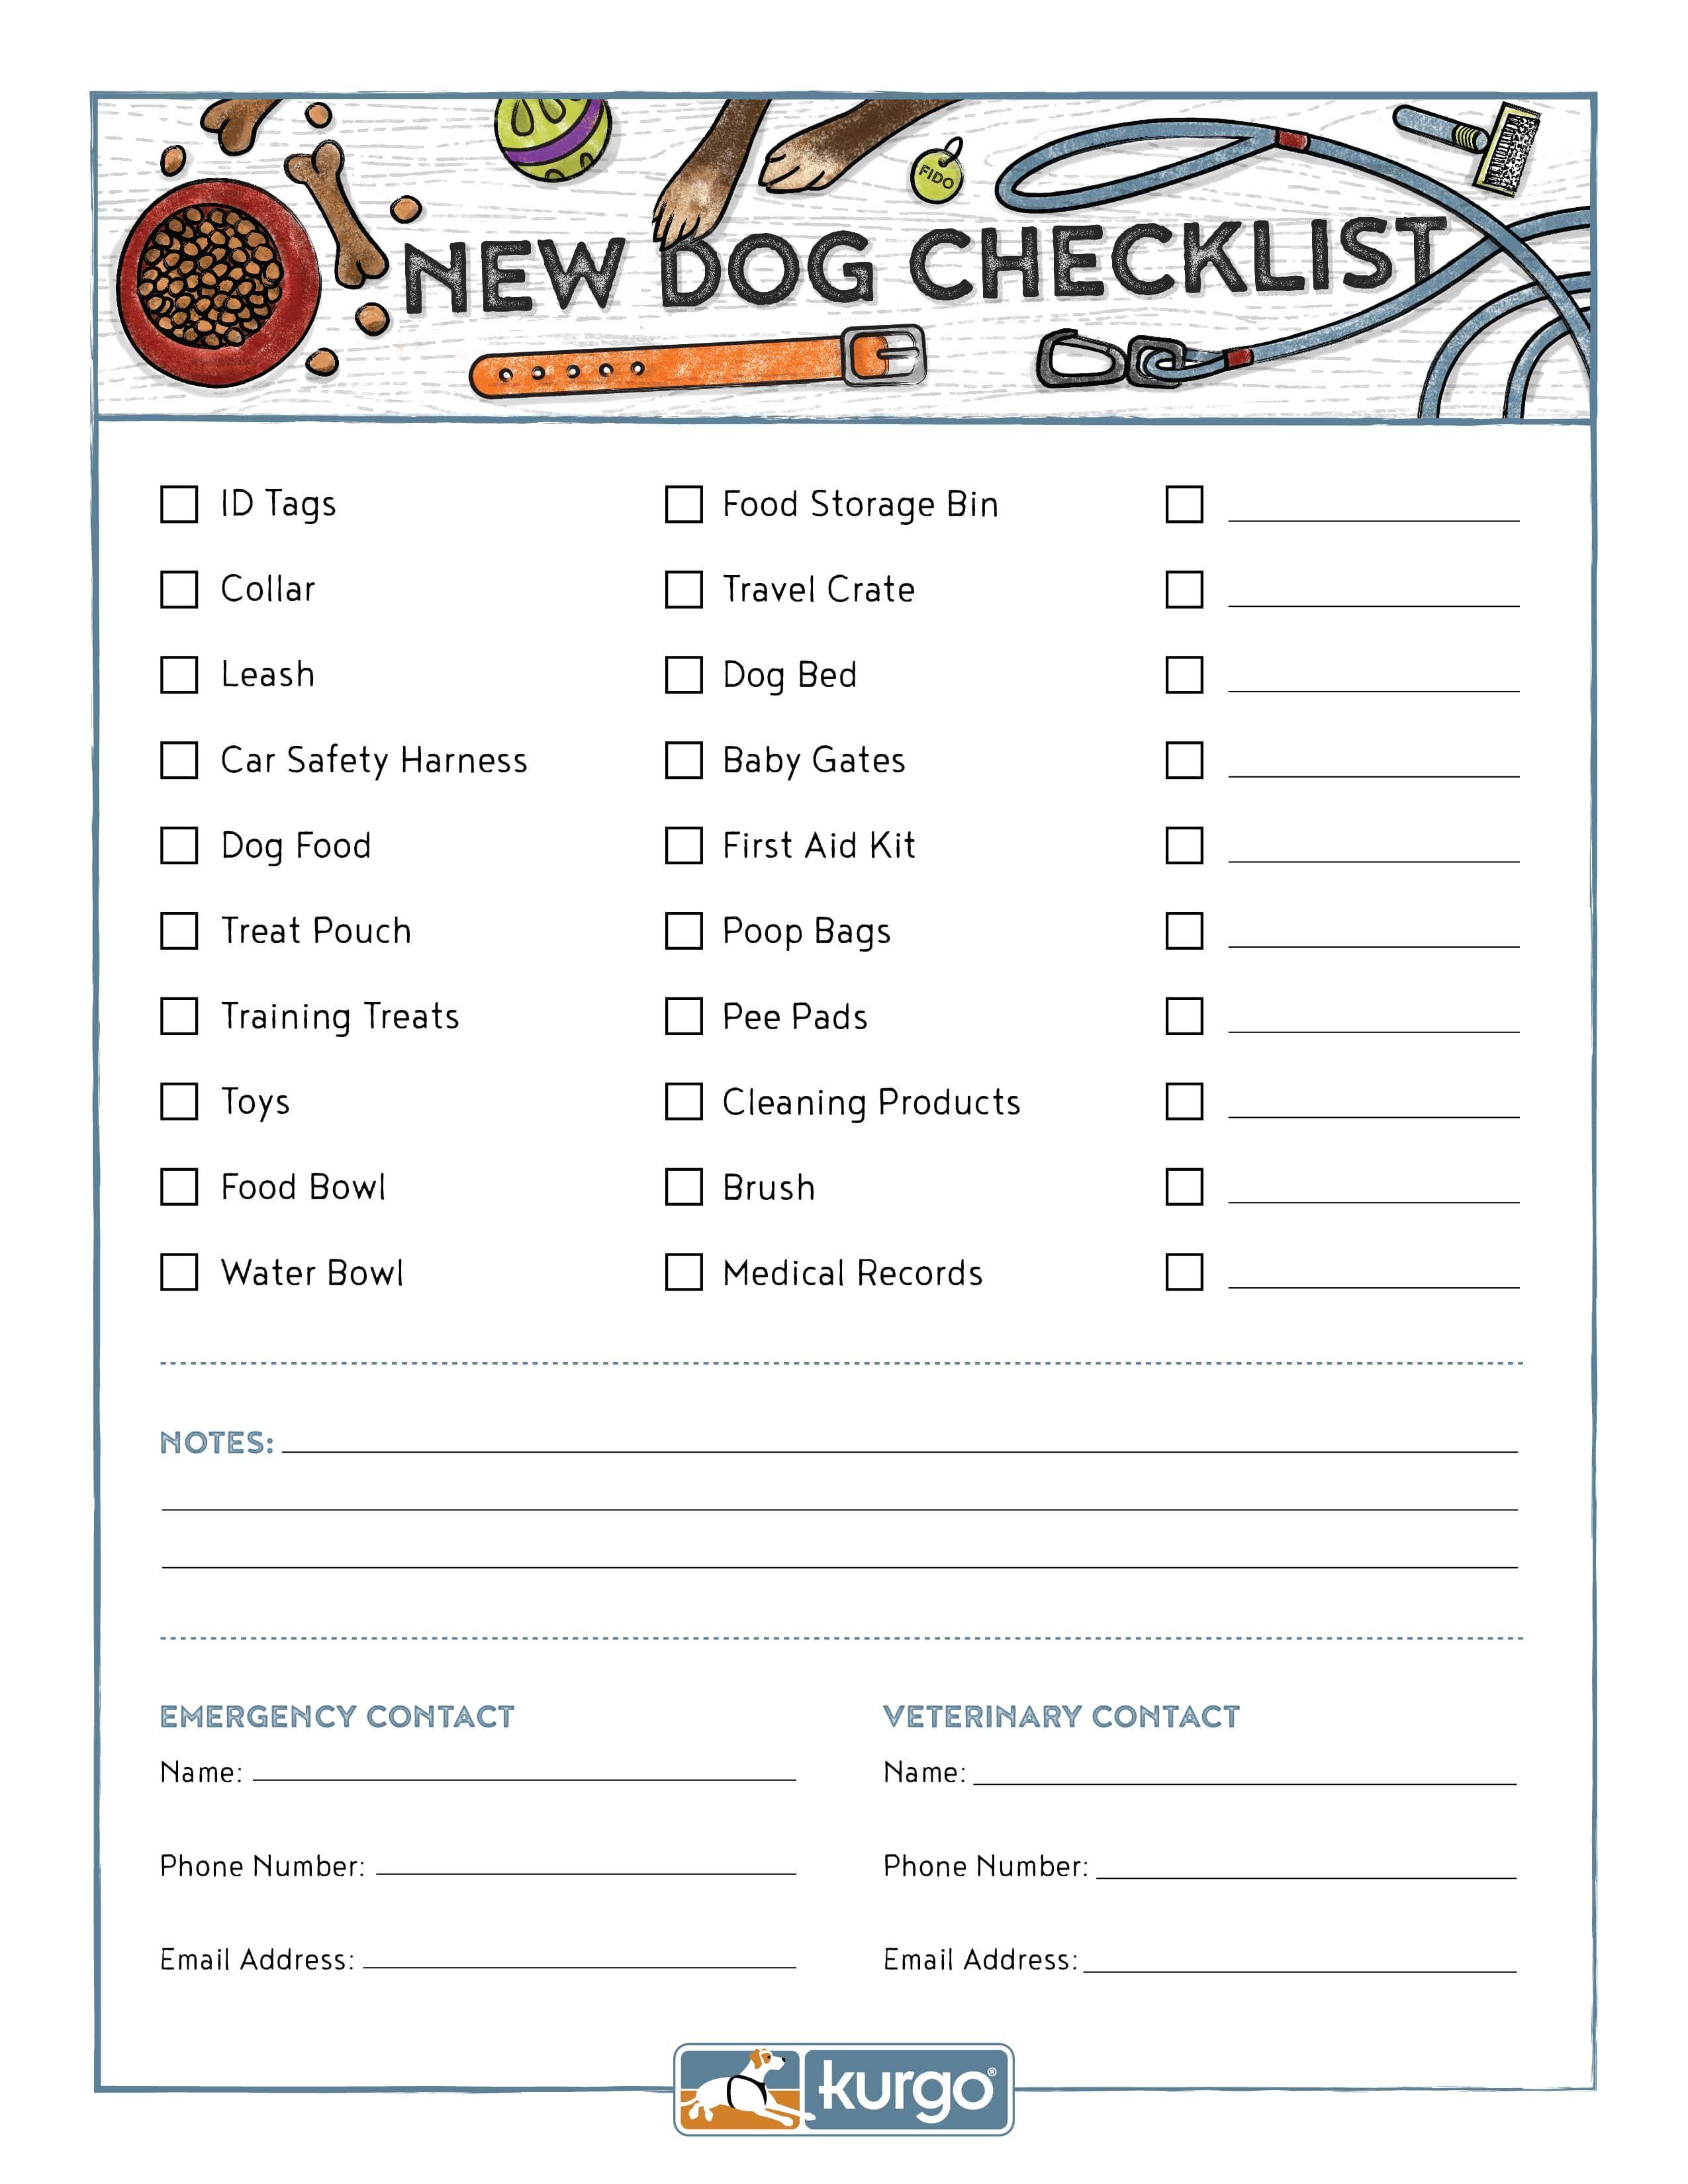 The New Dog Checklist